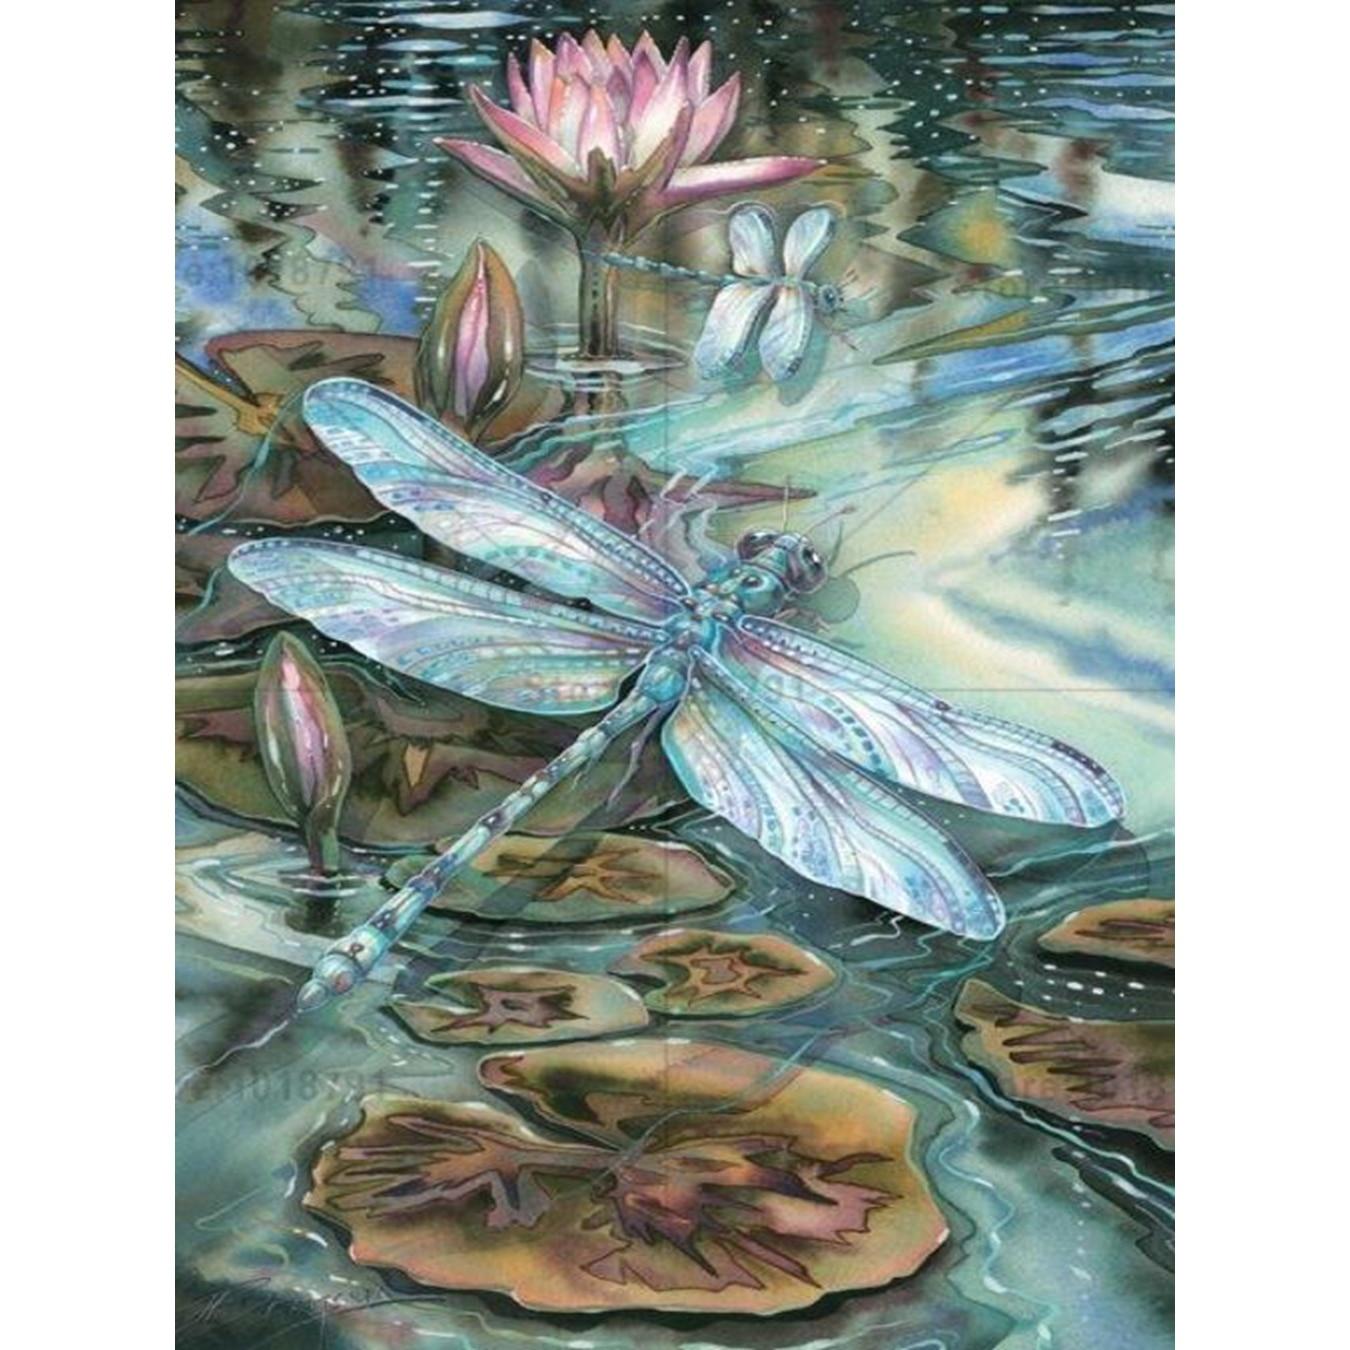 YTG New 5D DIY Full Round Rhinestone Needlework Embroidery Lotus Flower Diamond Painting Cross Stitch Room Decoration Gift